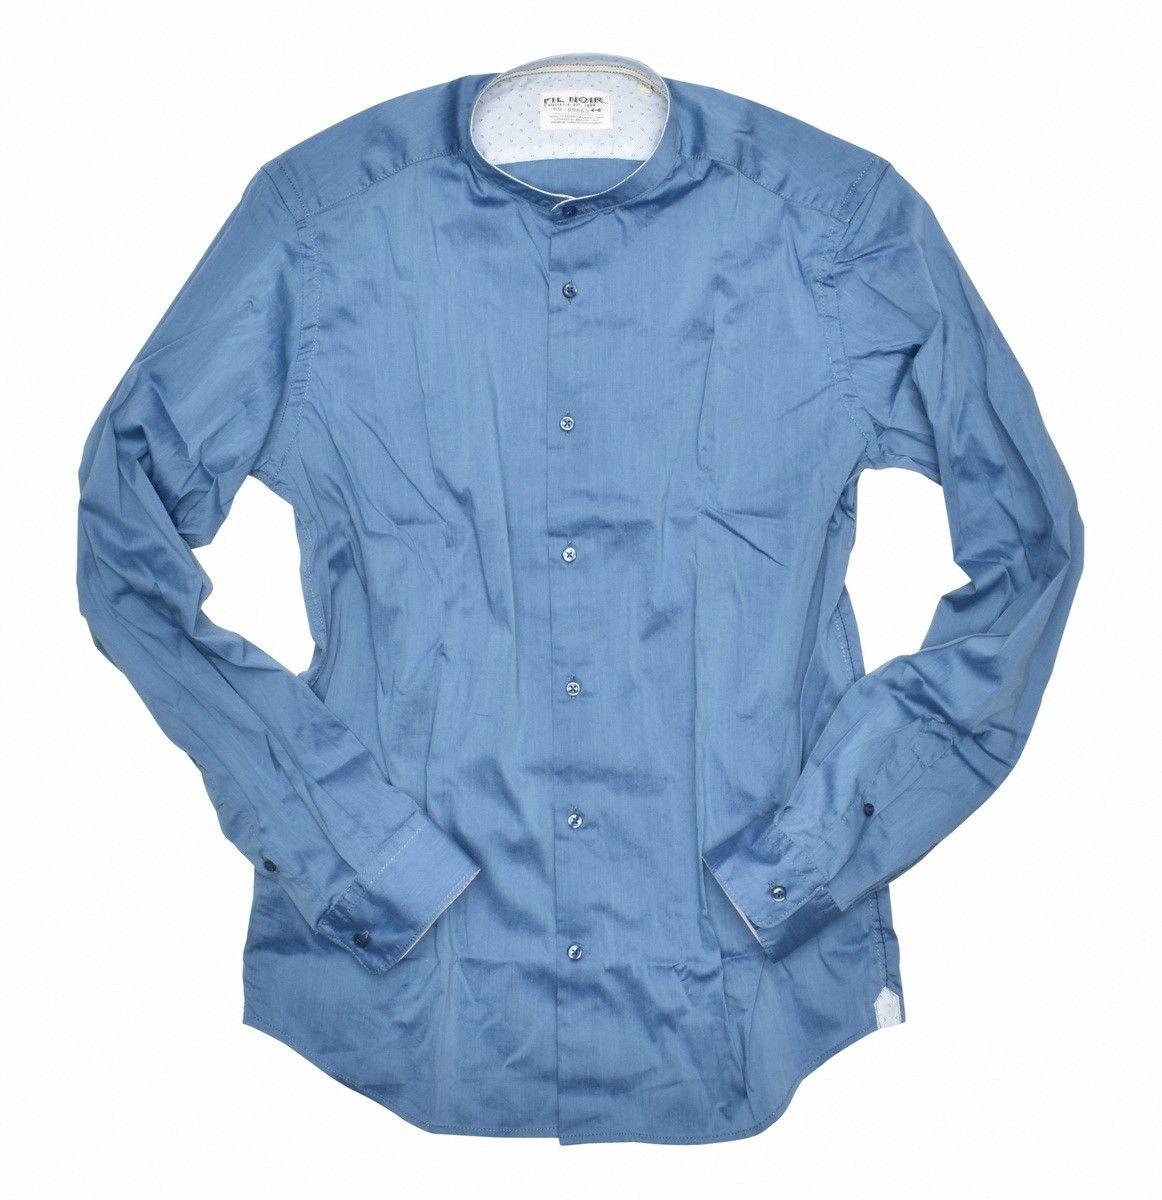 FIL NOIR - Herren Hemd - Piacenza Shaped Fit - Blue